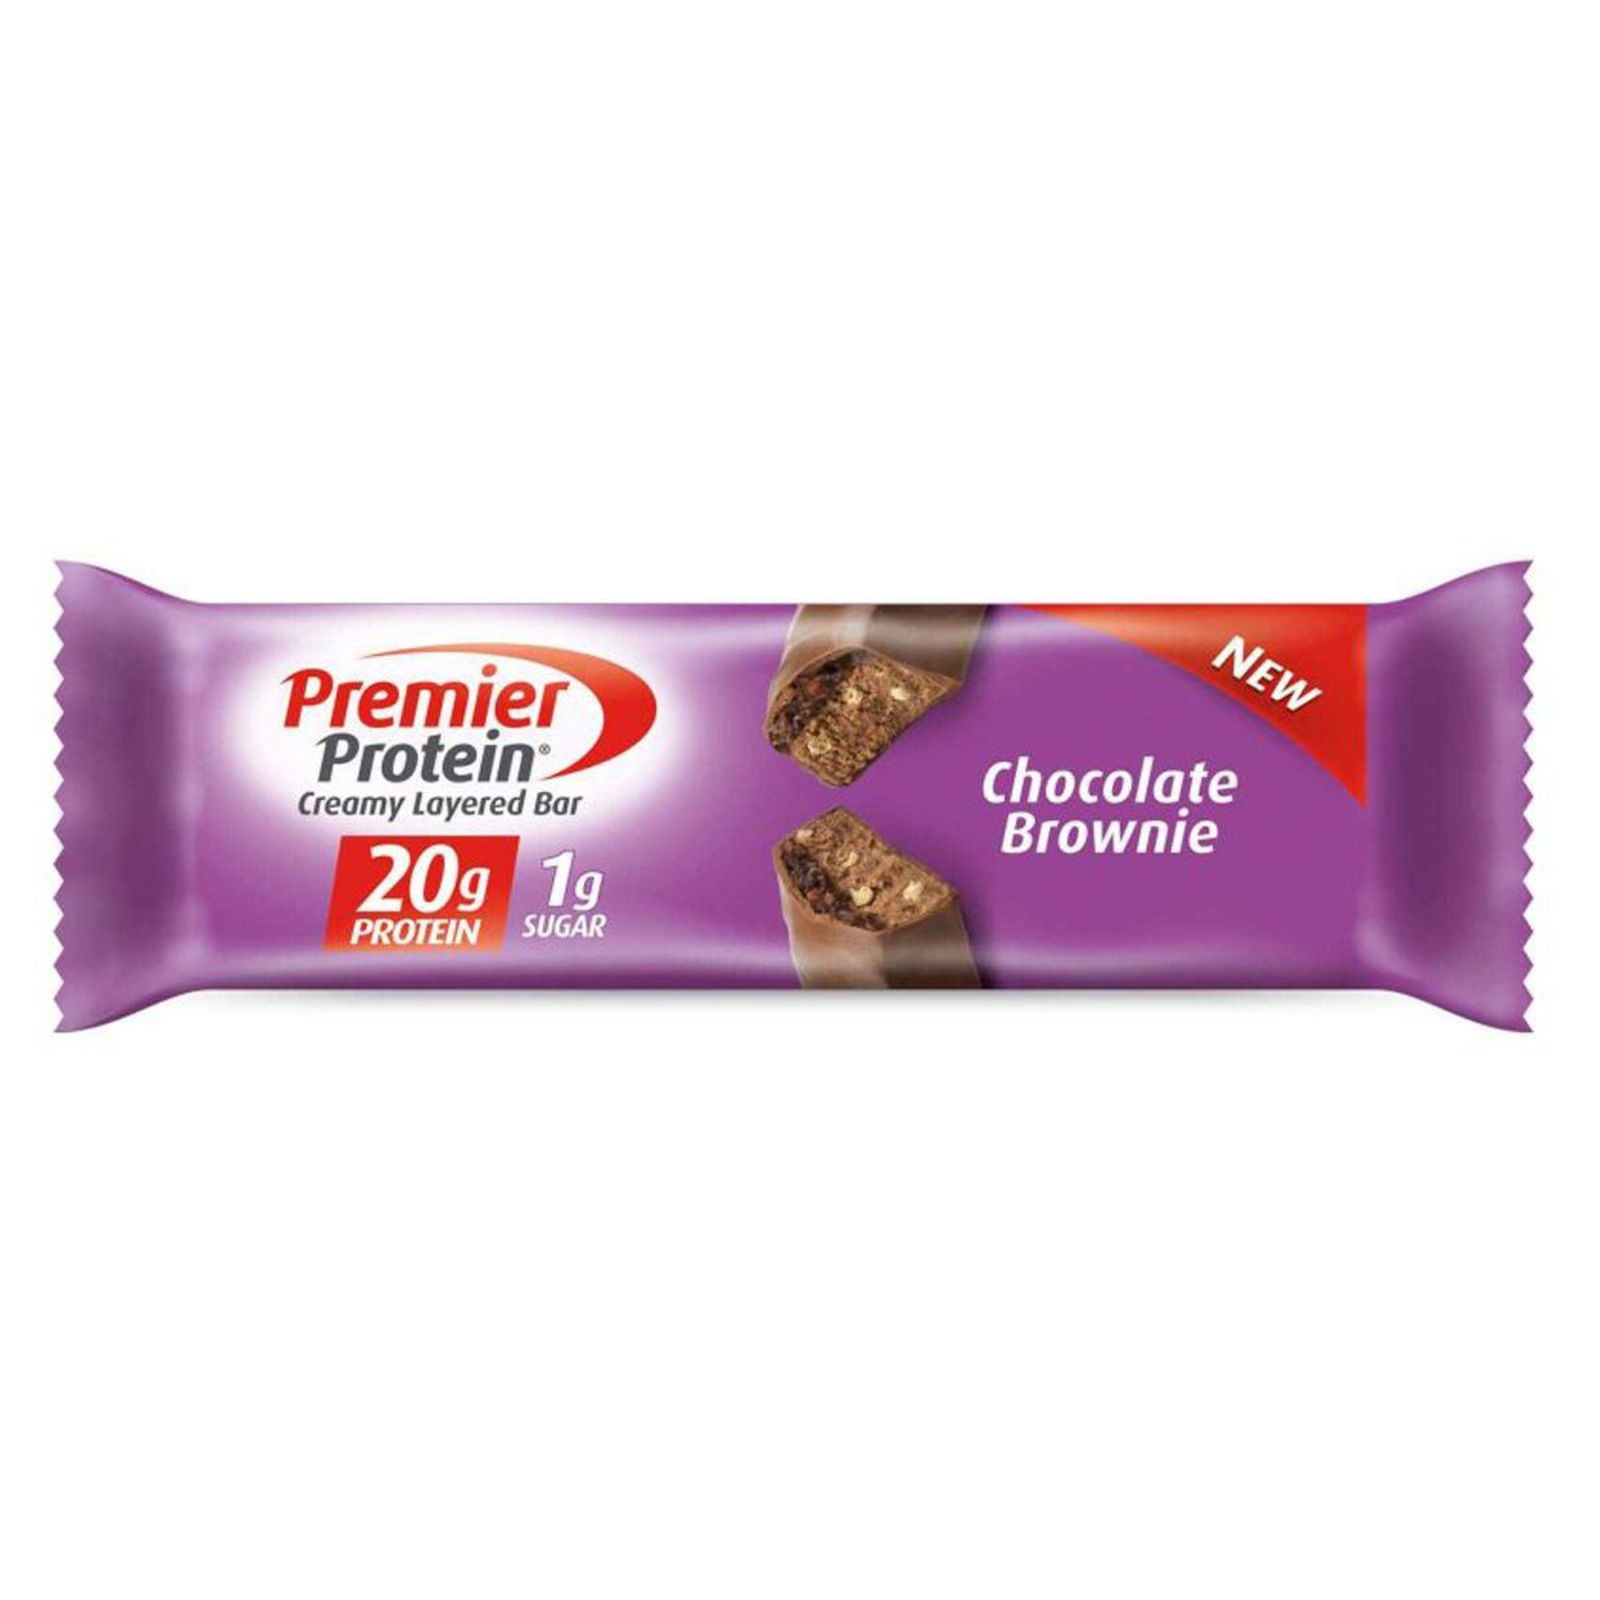 Premier Chocolate Brownie